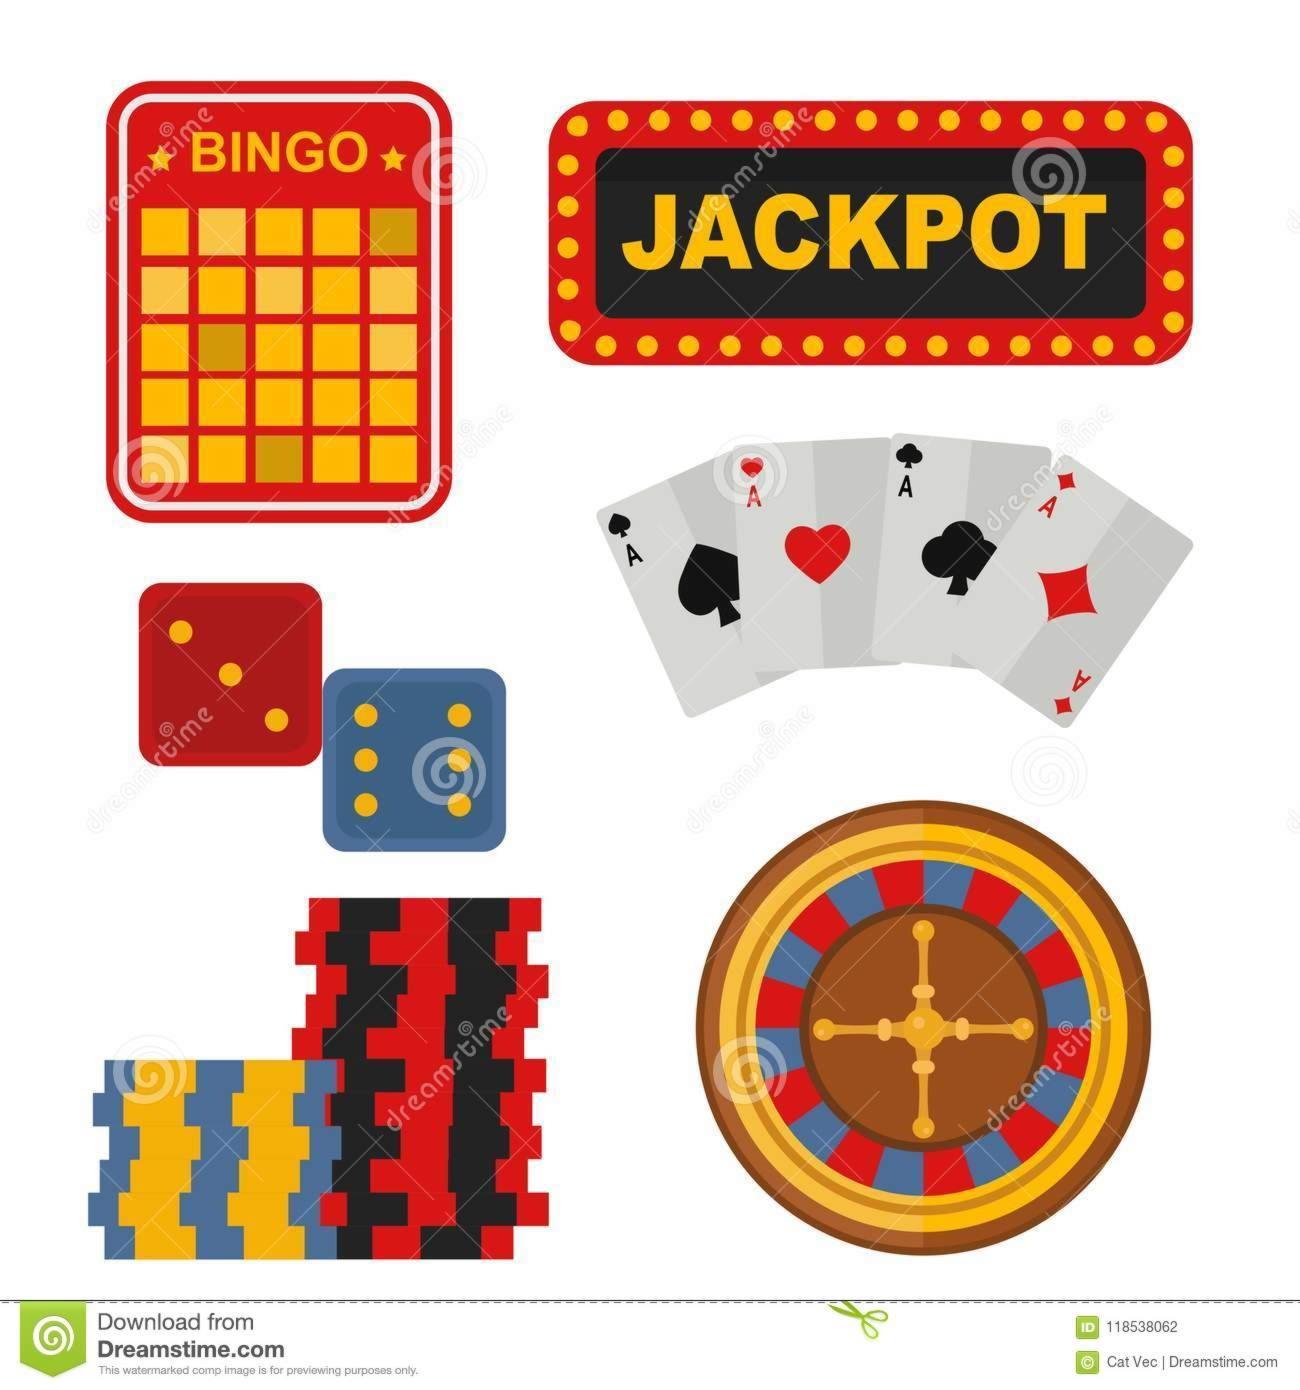 € 150 Casino Tournament ve Fortune pyramid